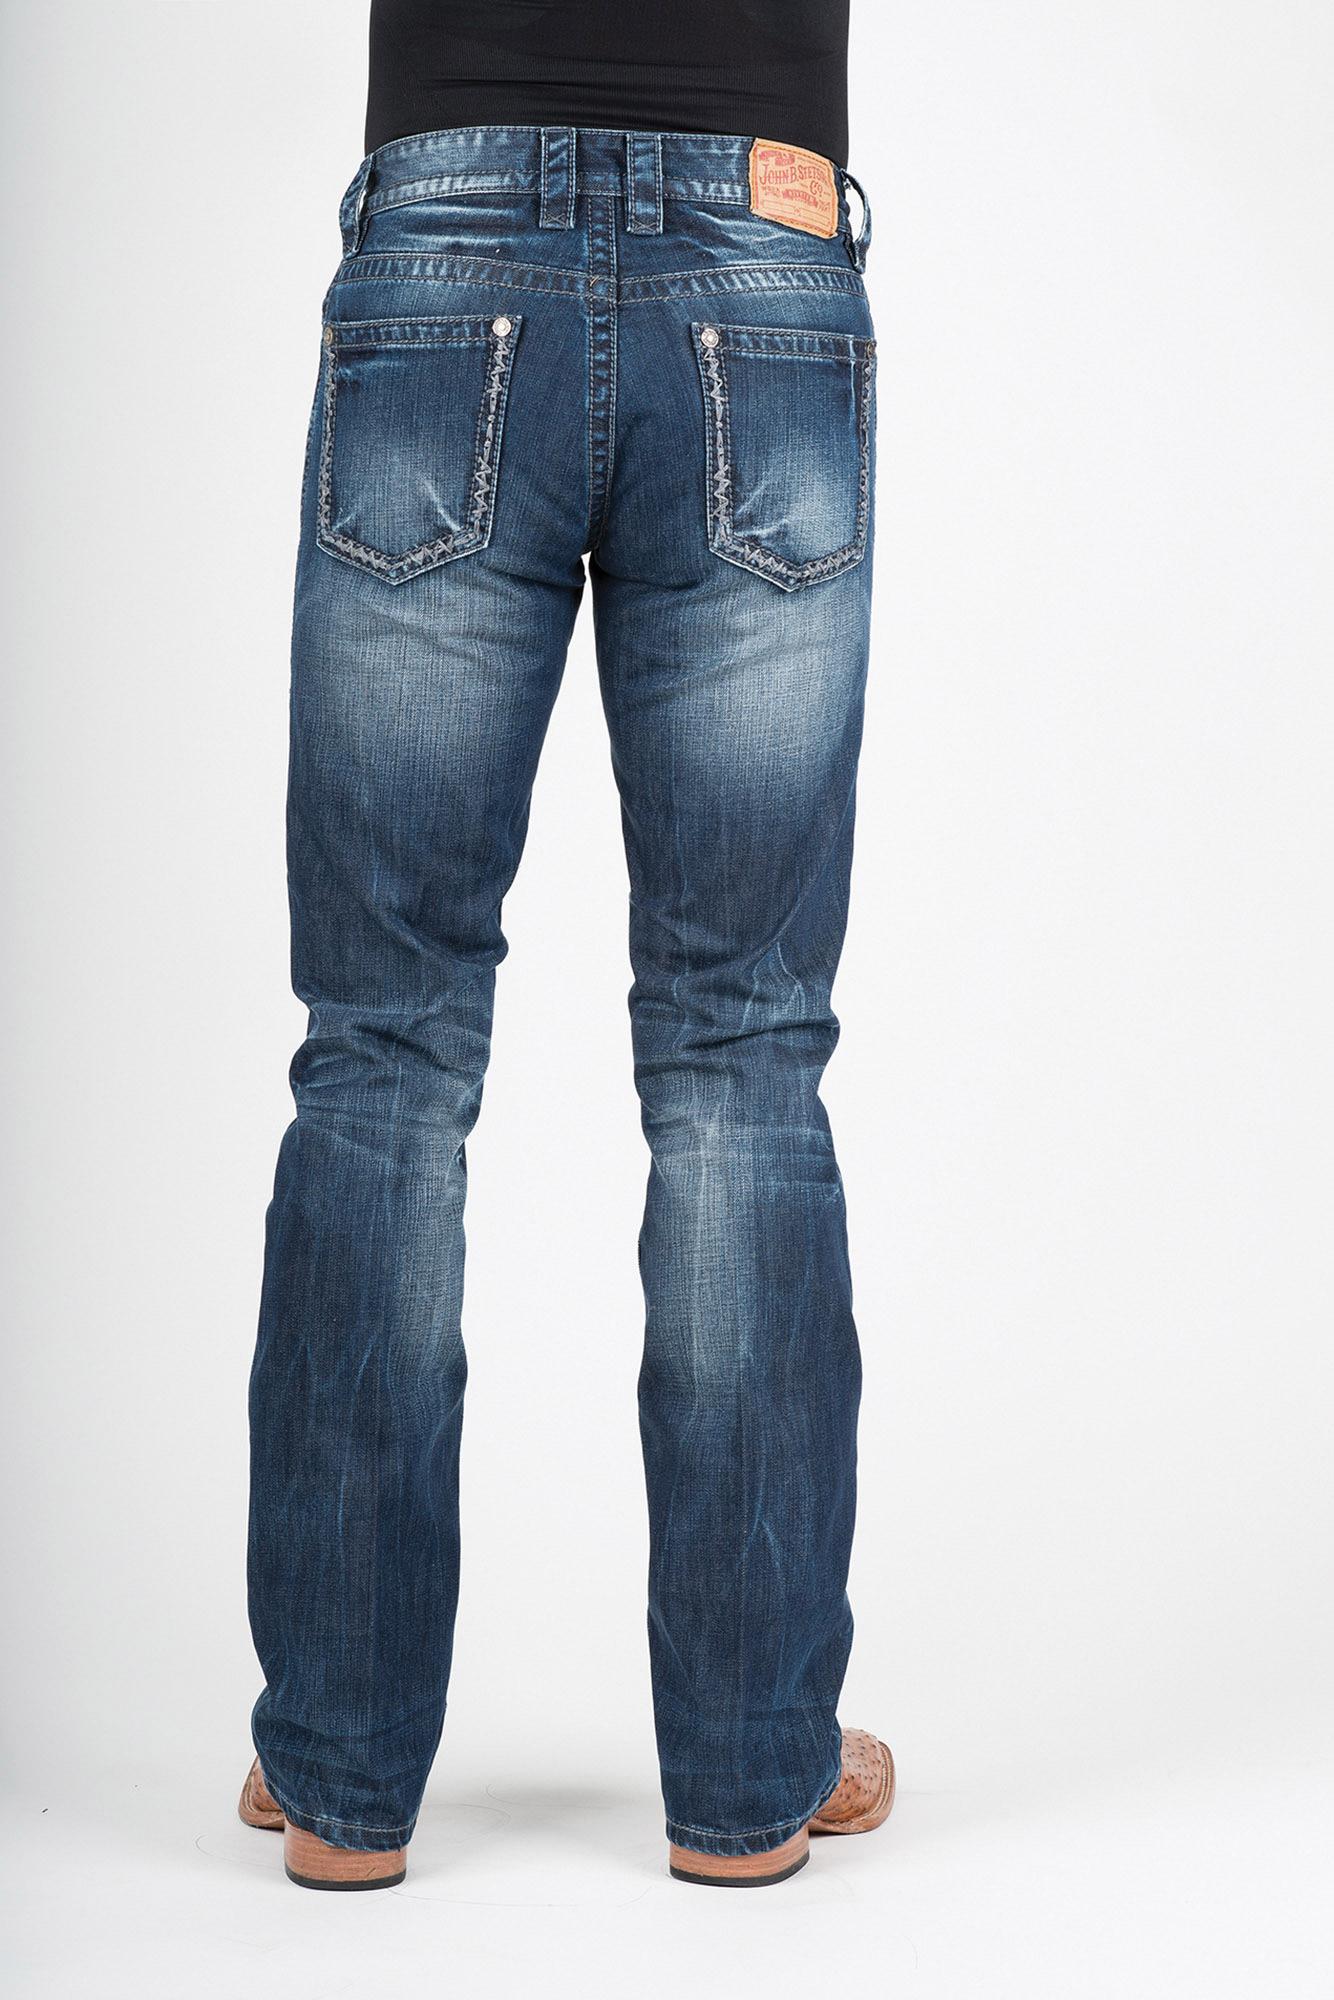 Mens Pocket T Shirts Tall